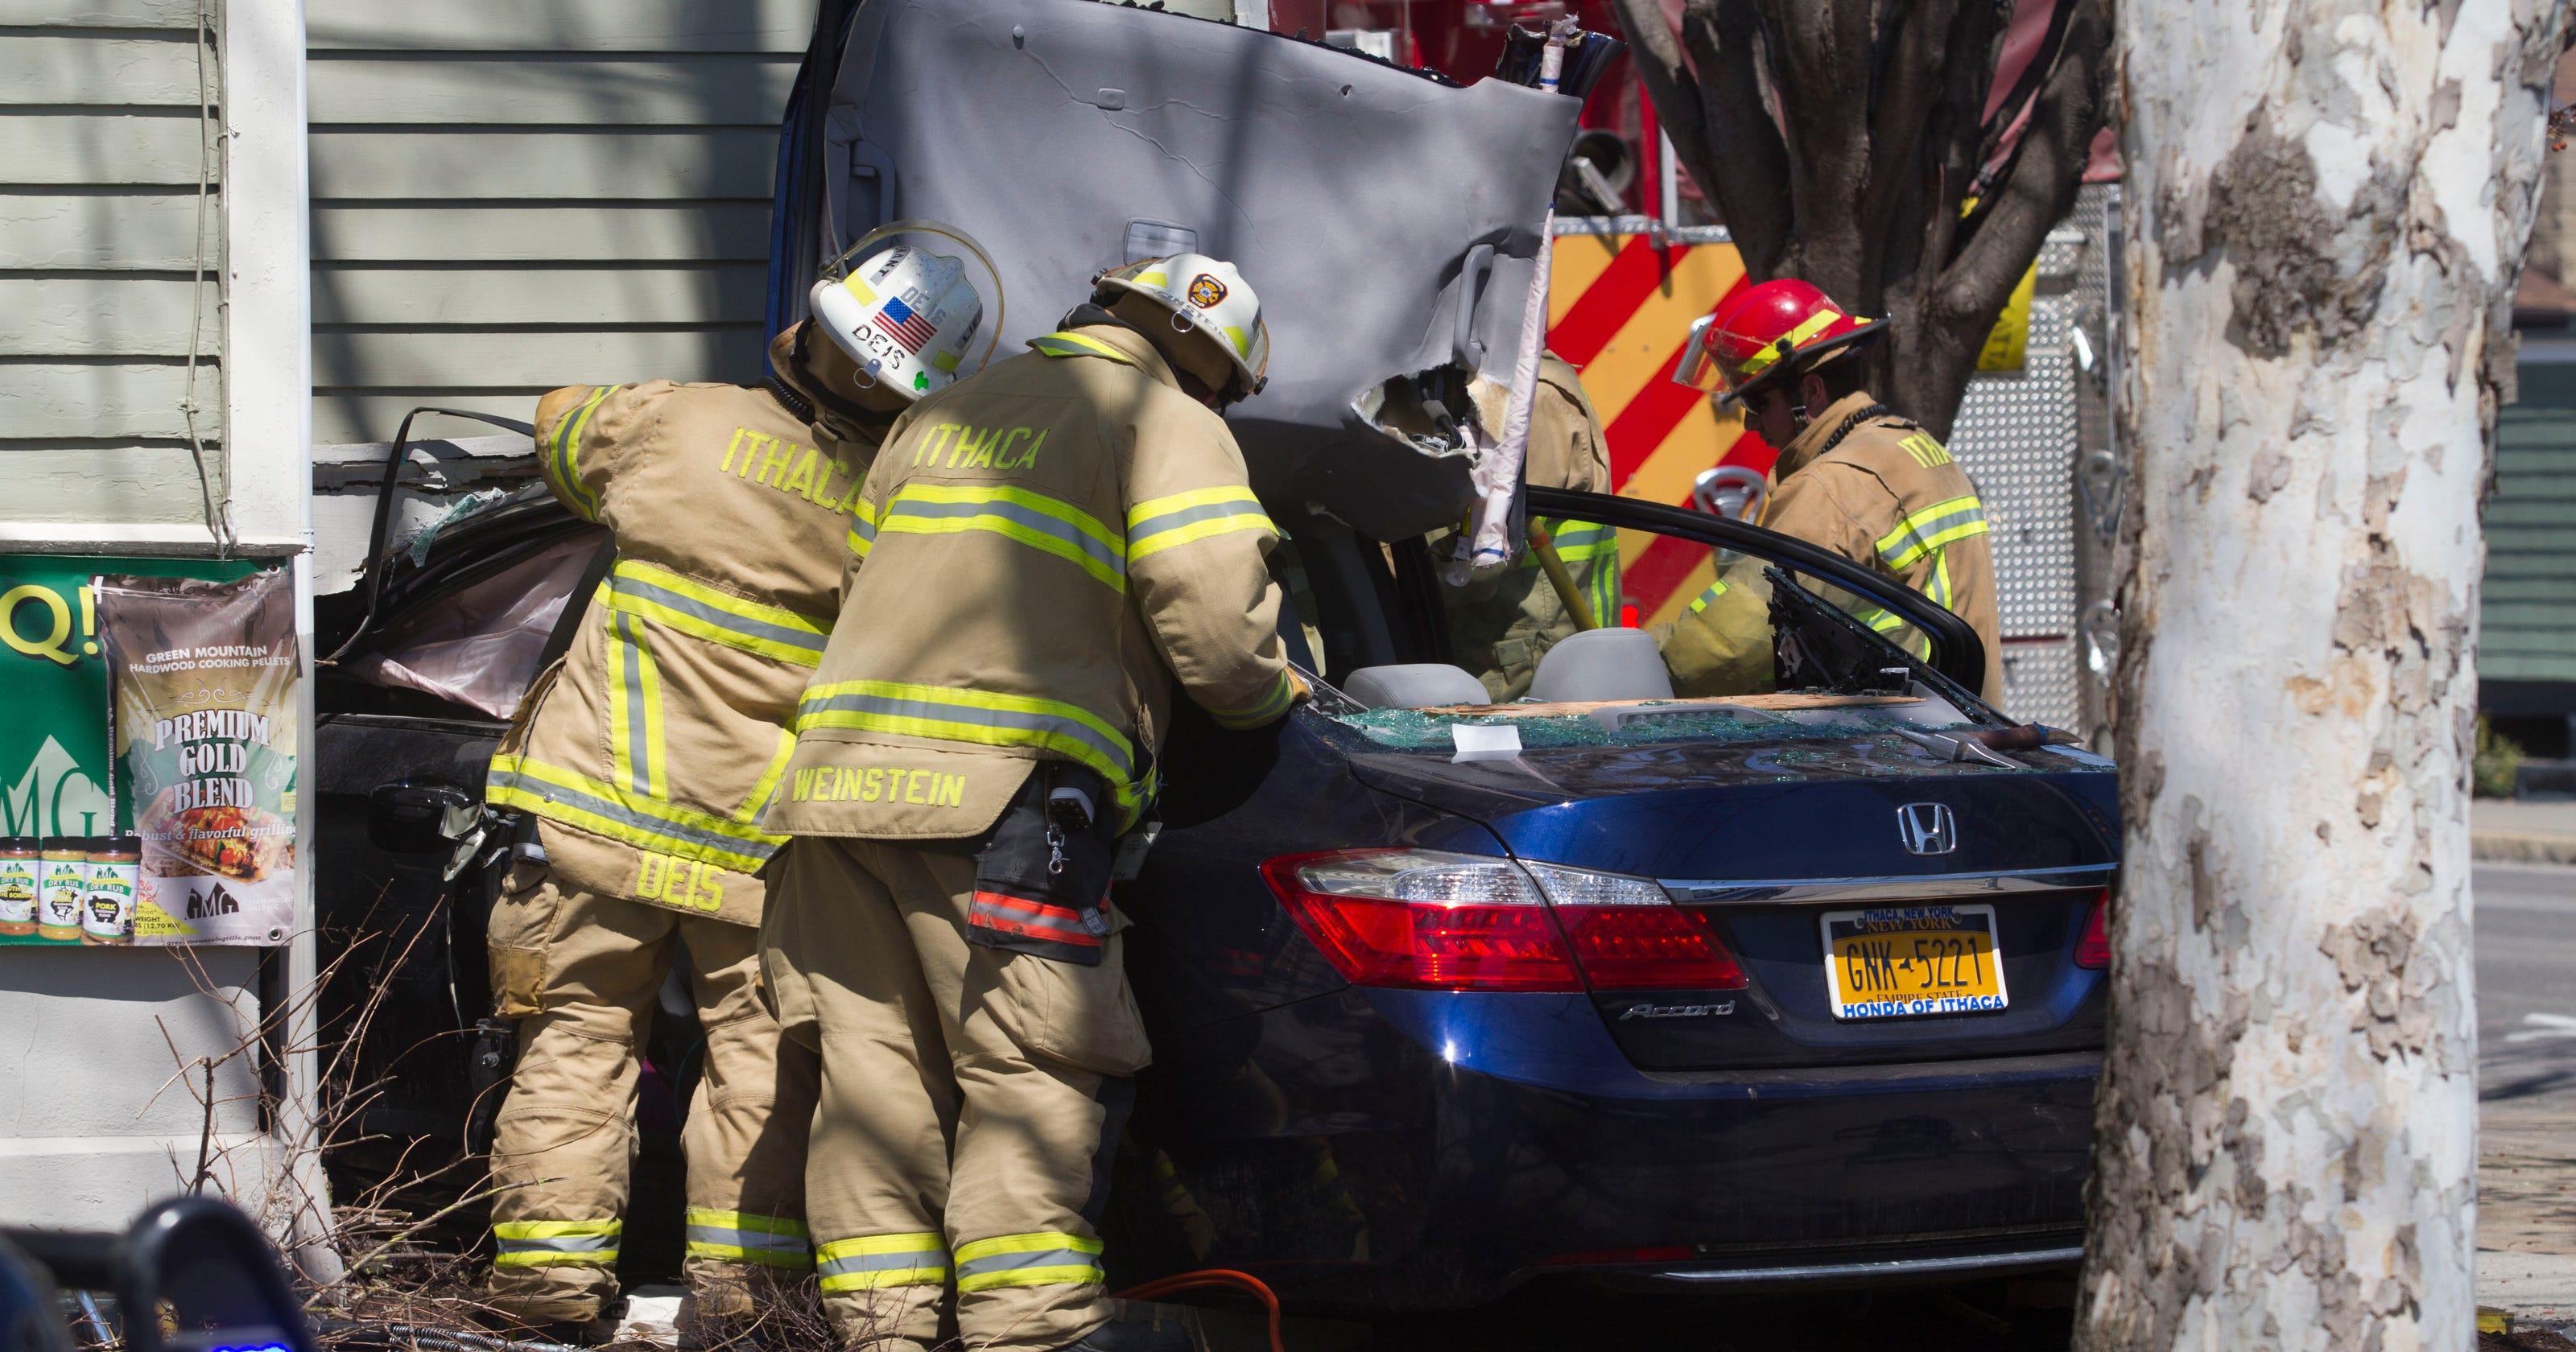 Car wrecks into Ithaca Stoveworks porch